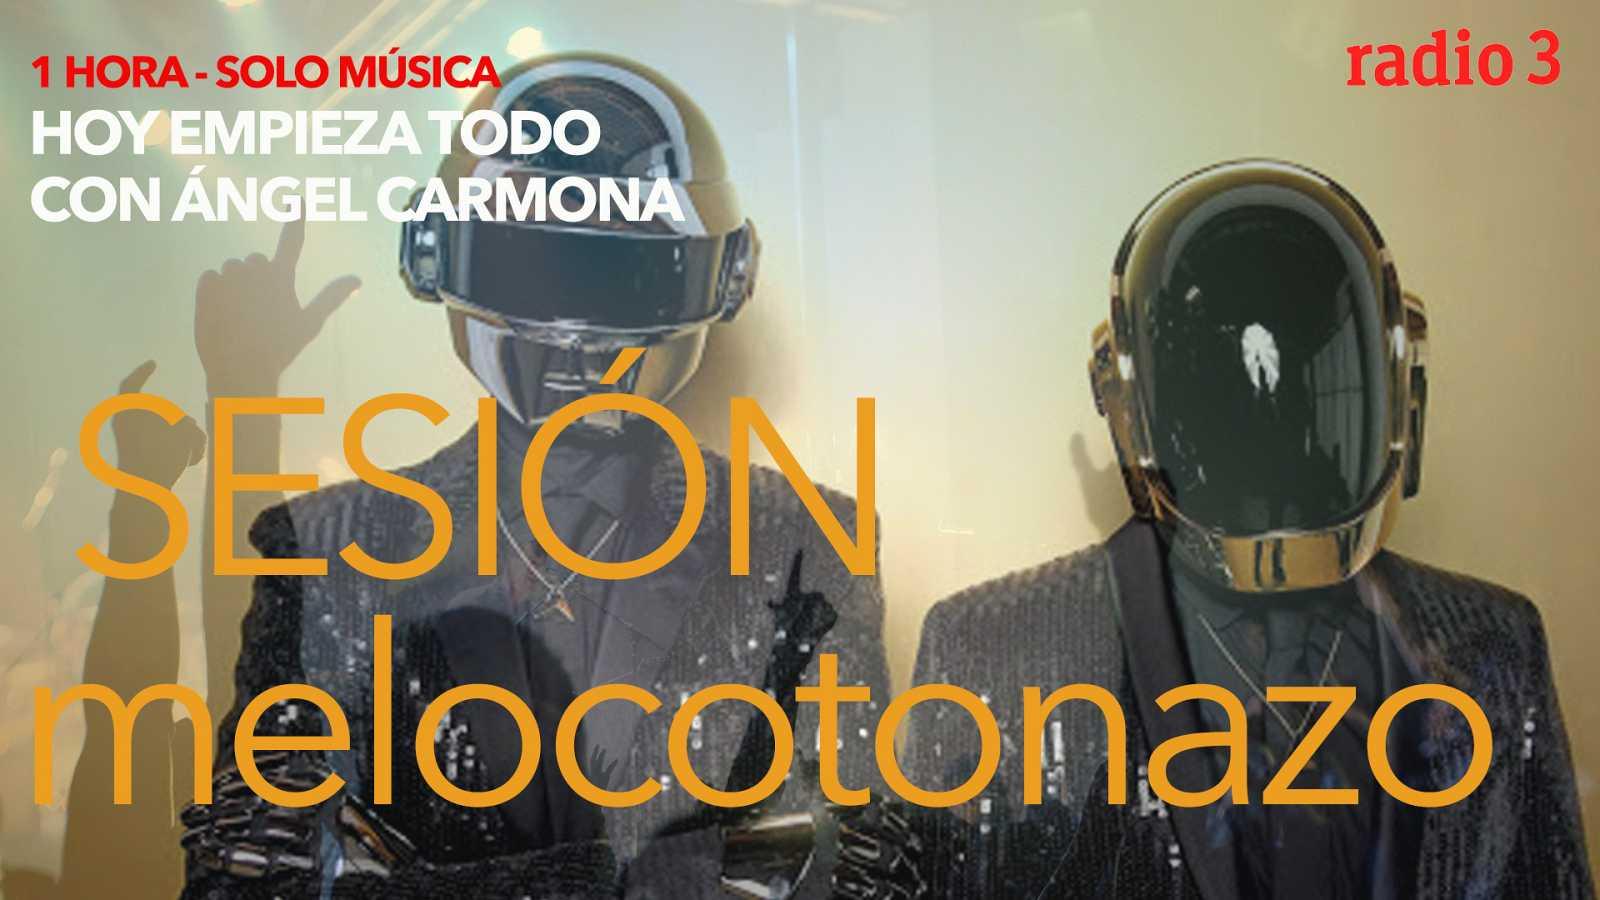 Hoy empieza todo con Ángel Carmona - #SesiónMelocotonazo: Jefferson Airplane, Daft Punk, Arde Bogotá... - 30/10/20 - escuchar ahora